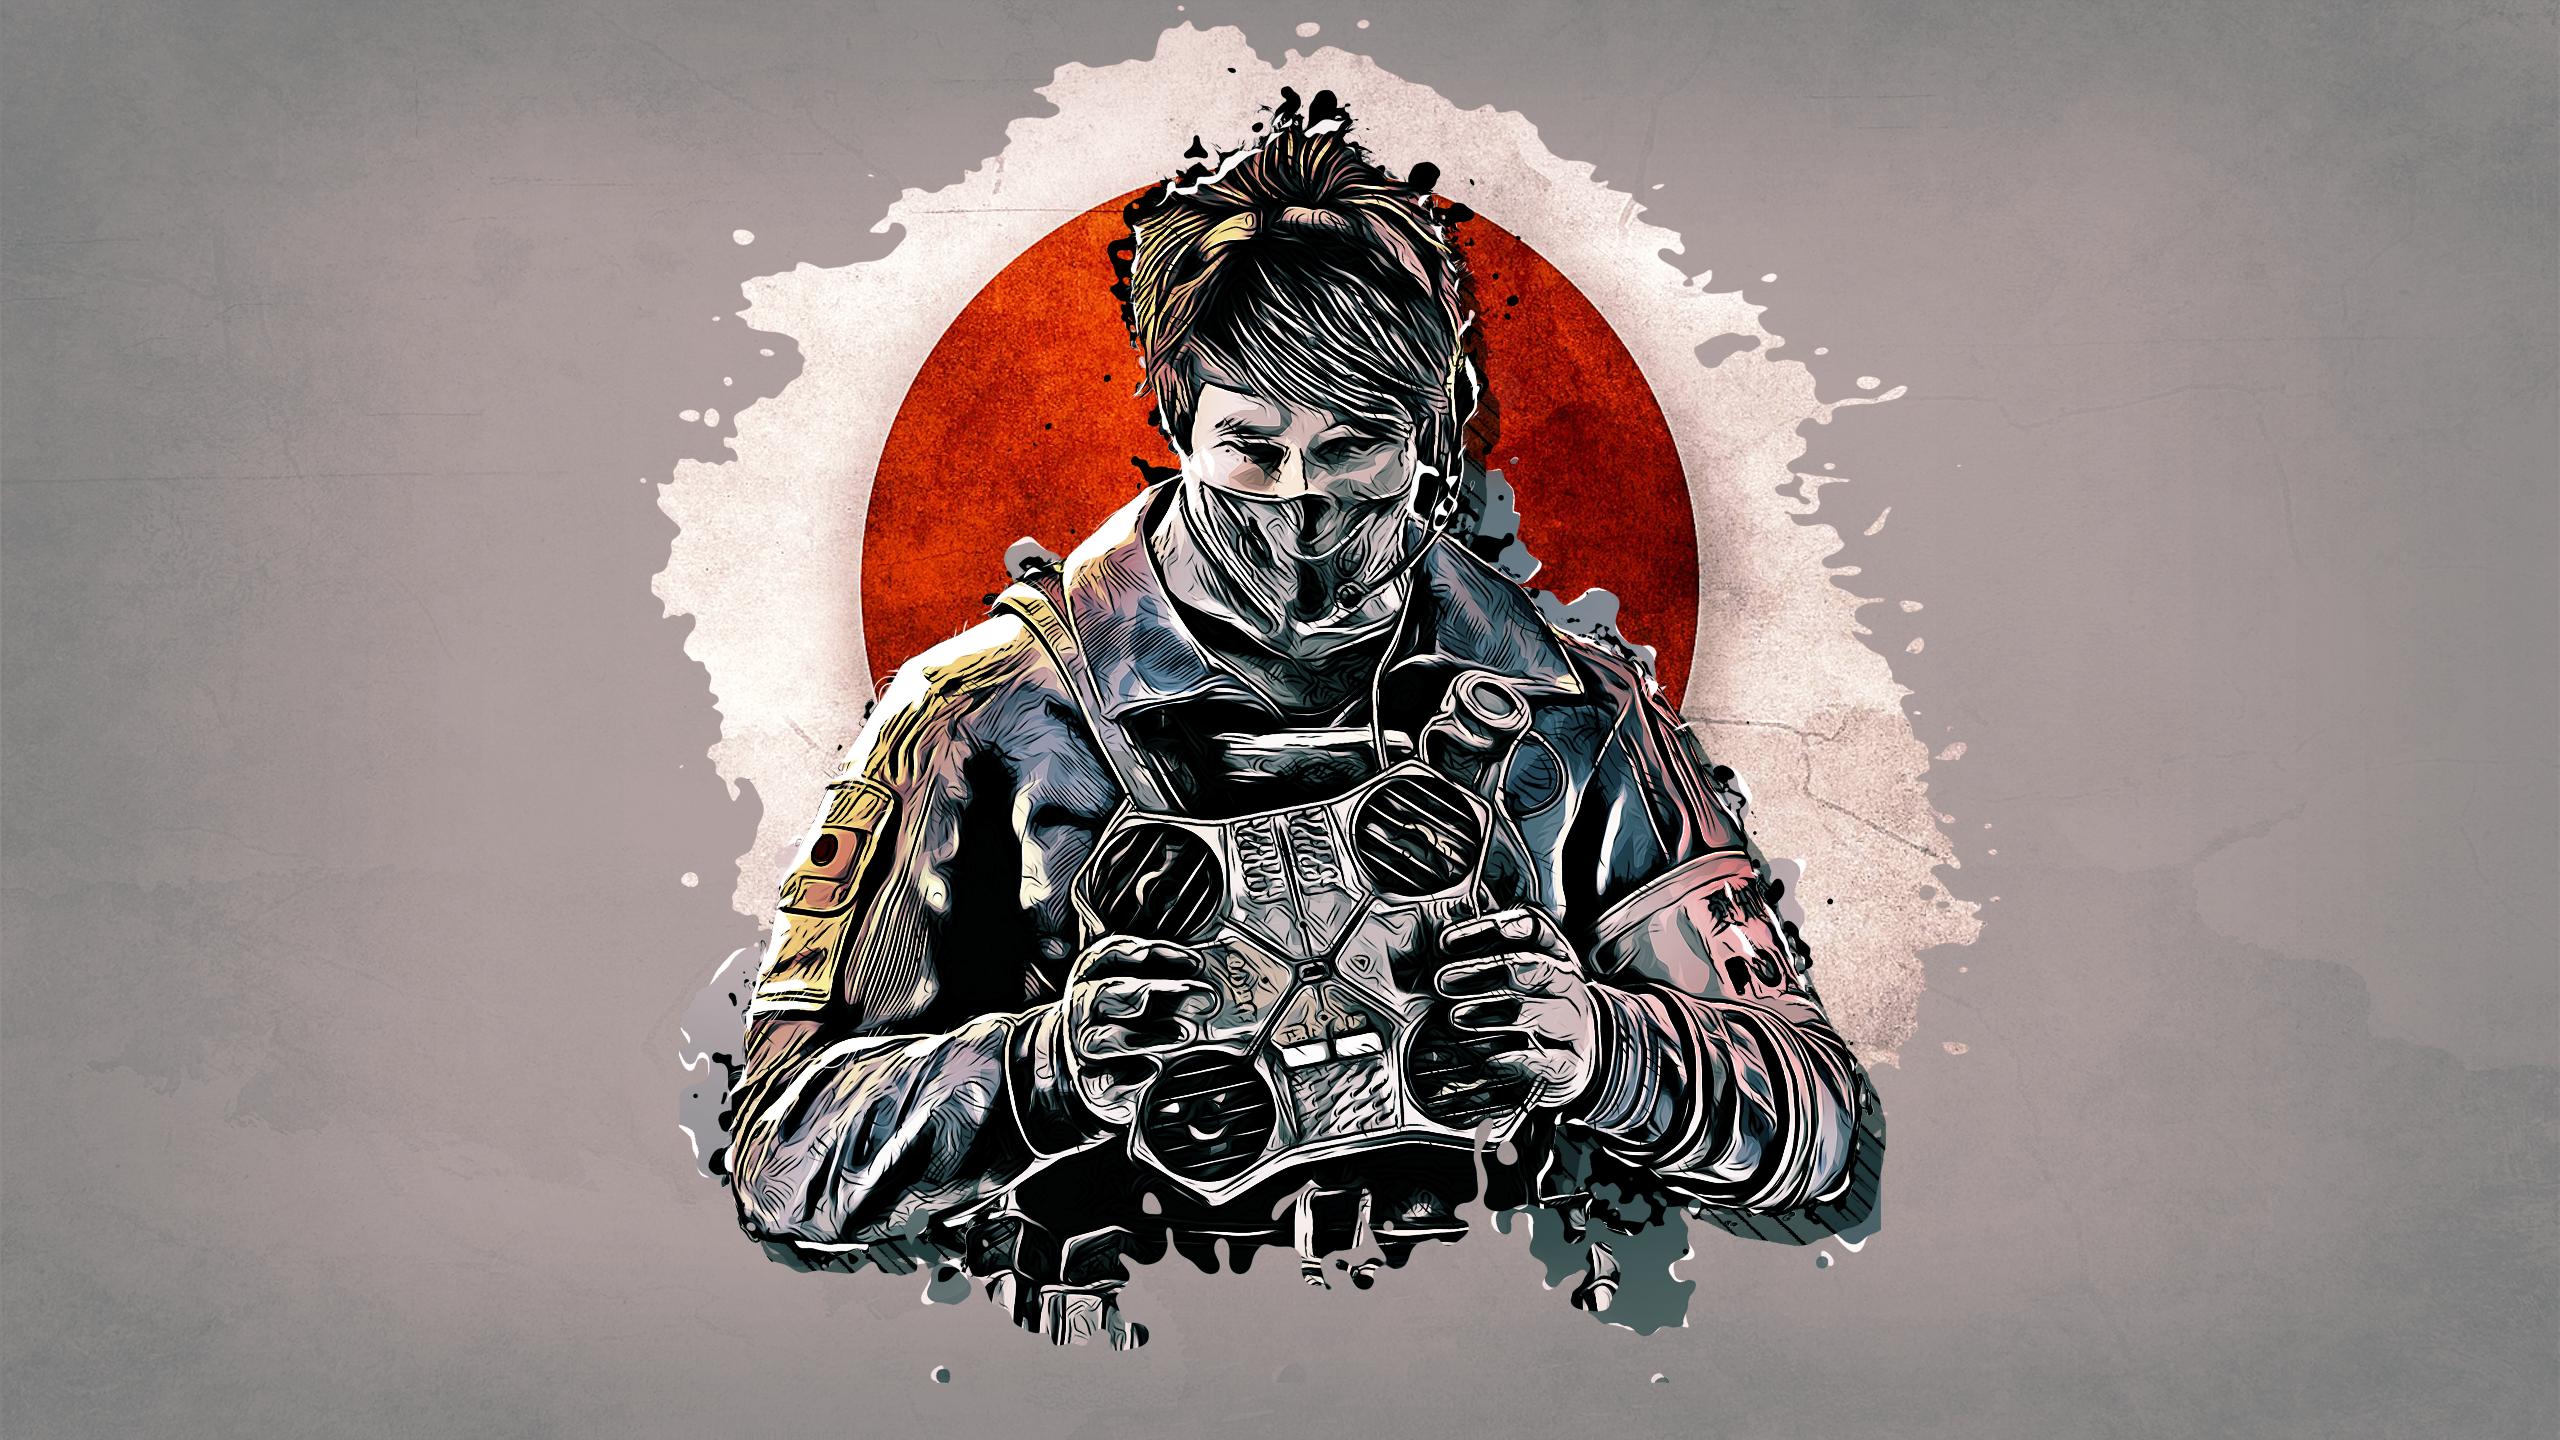 General 2560x1440 video games Rainbow Six: Siege Tom Clancy's Rainbow Six